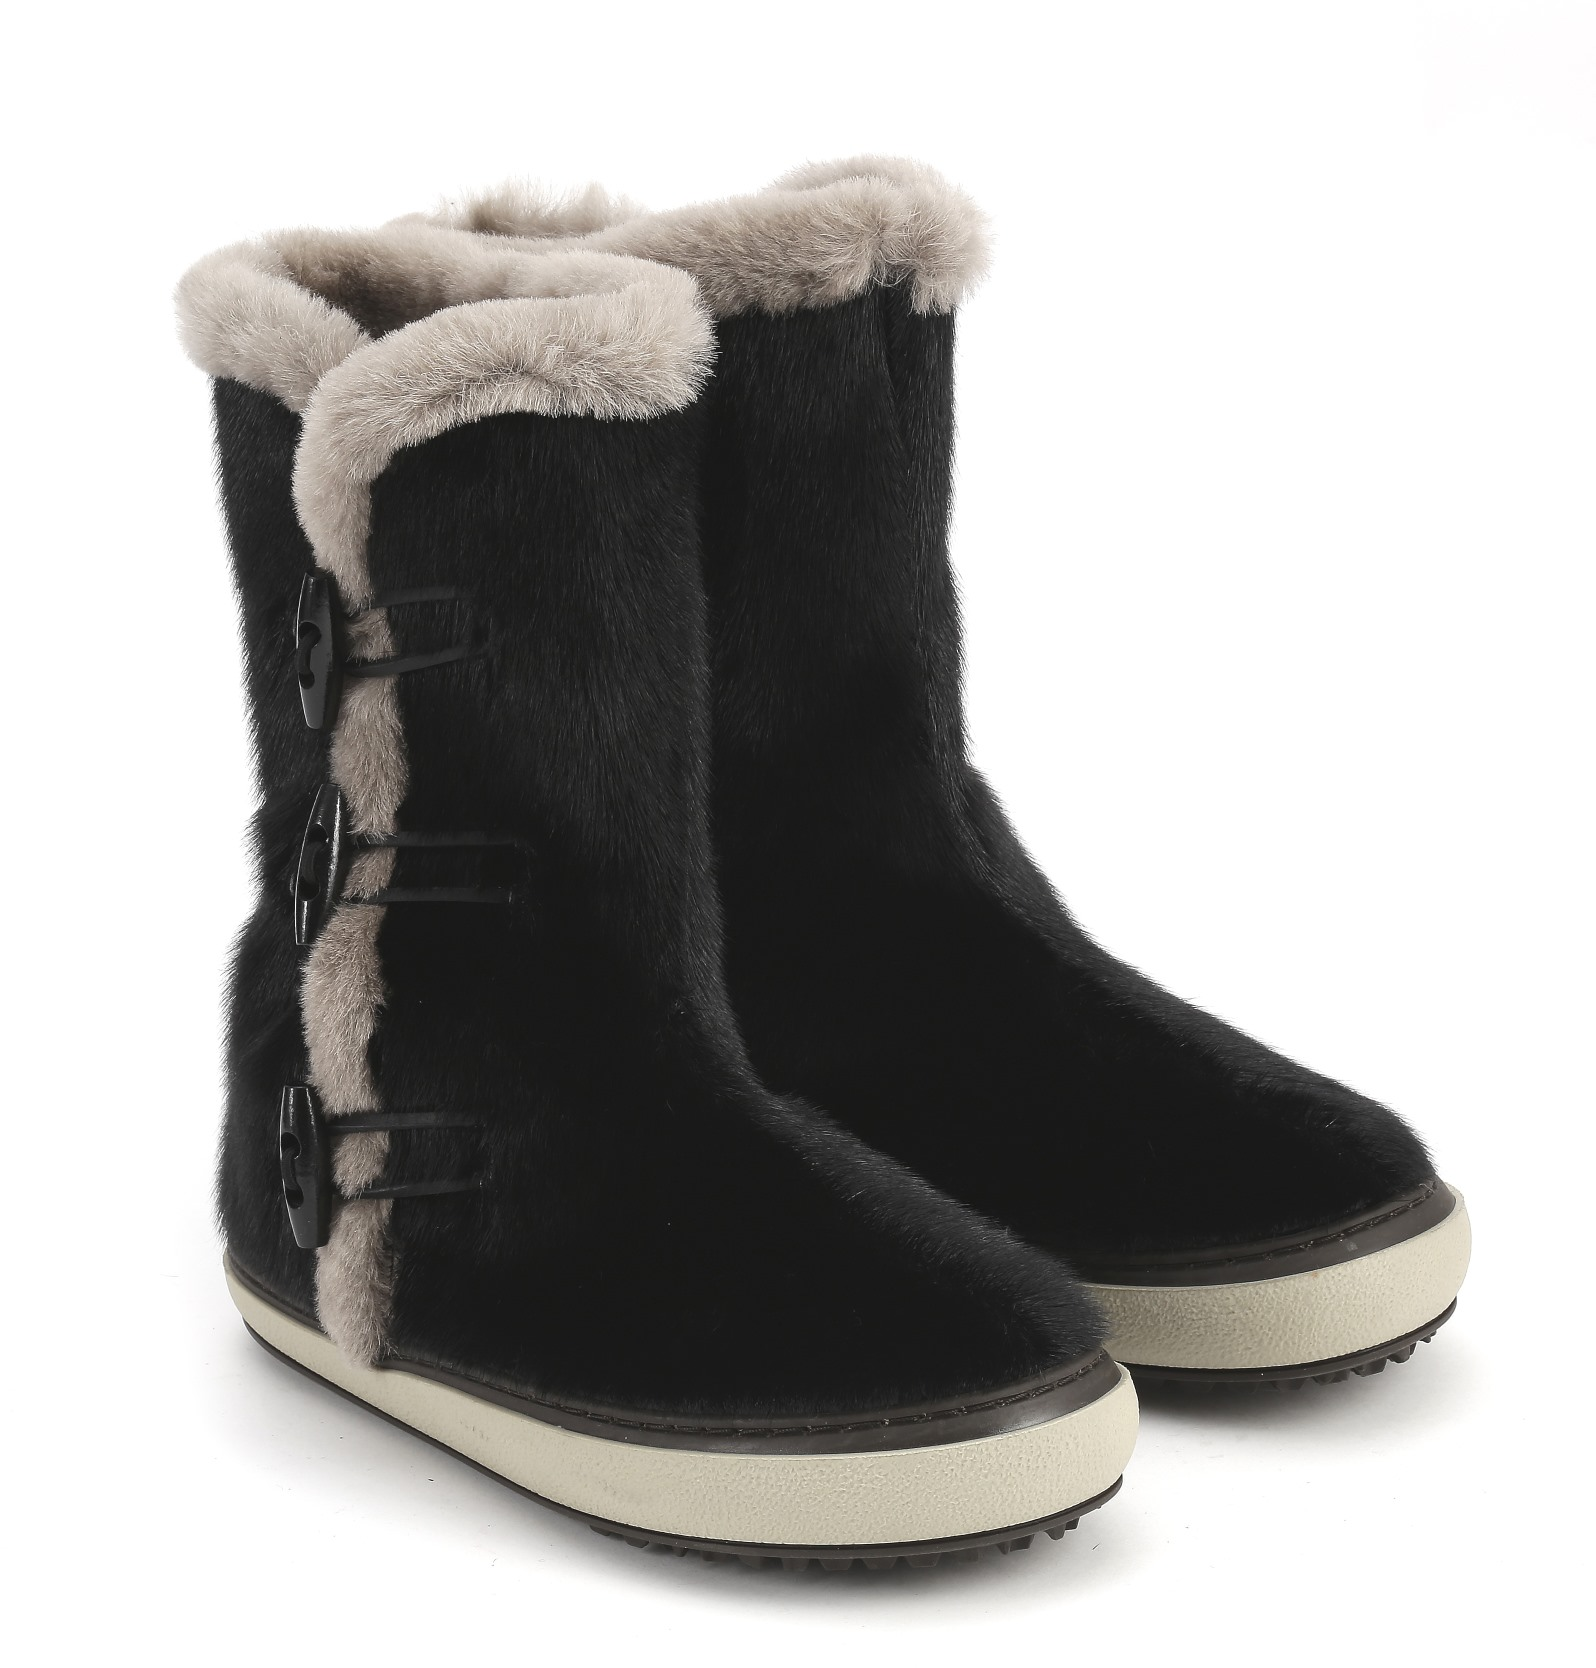 Обувь зимняя SnowBoot, black, size 42